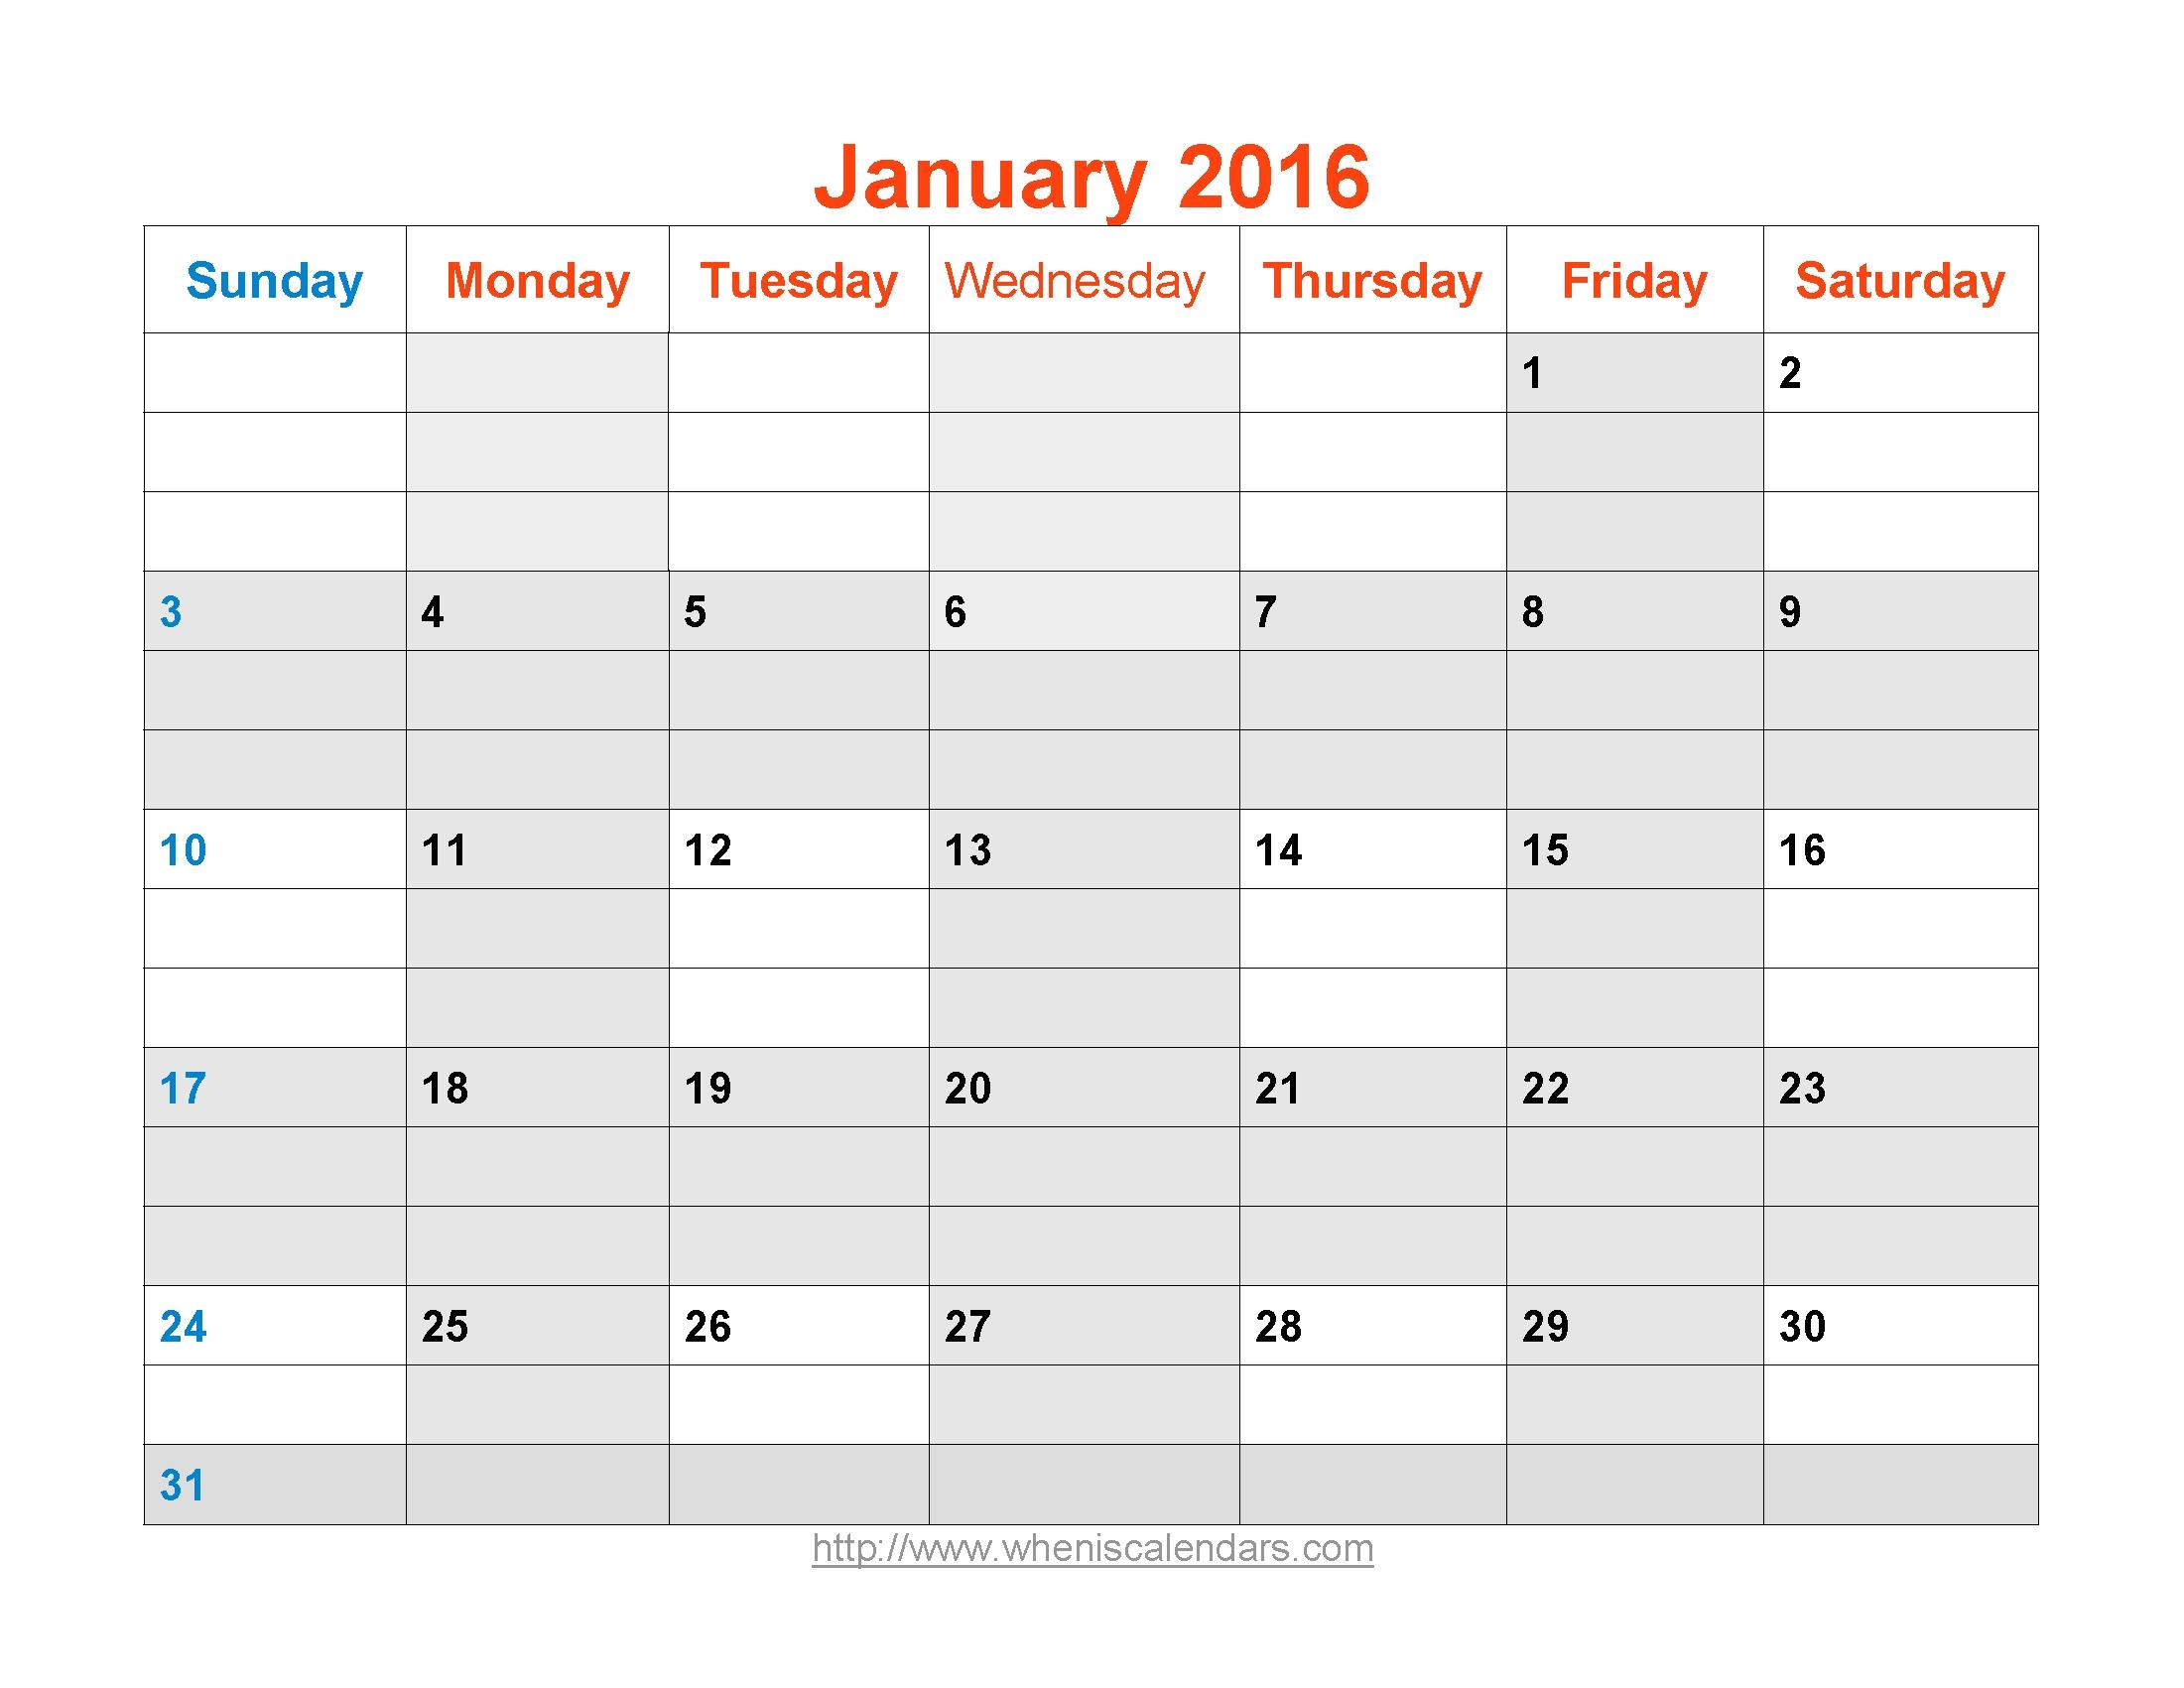 January 2016 Calendar Printable Template Word Pdf Image3abry